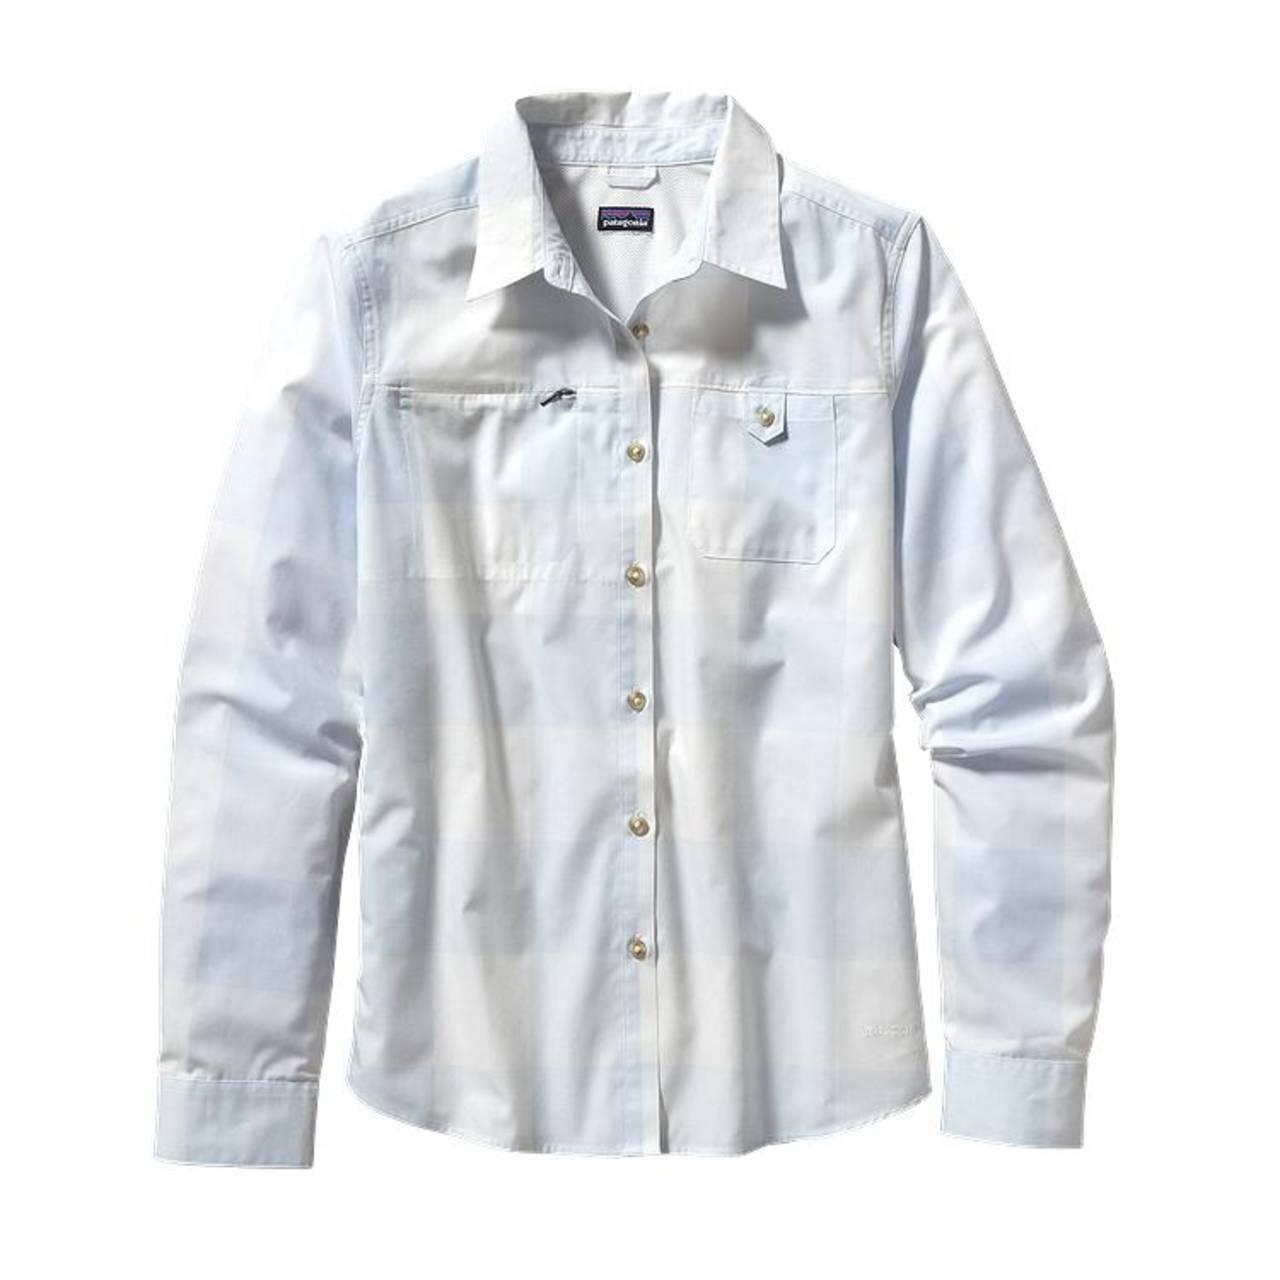 Patagonia Women's Island Hopper Shirt